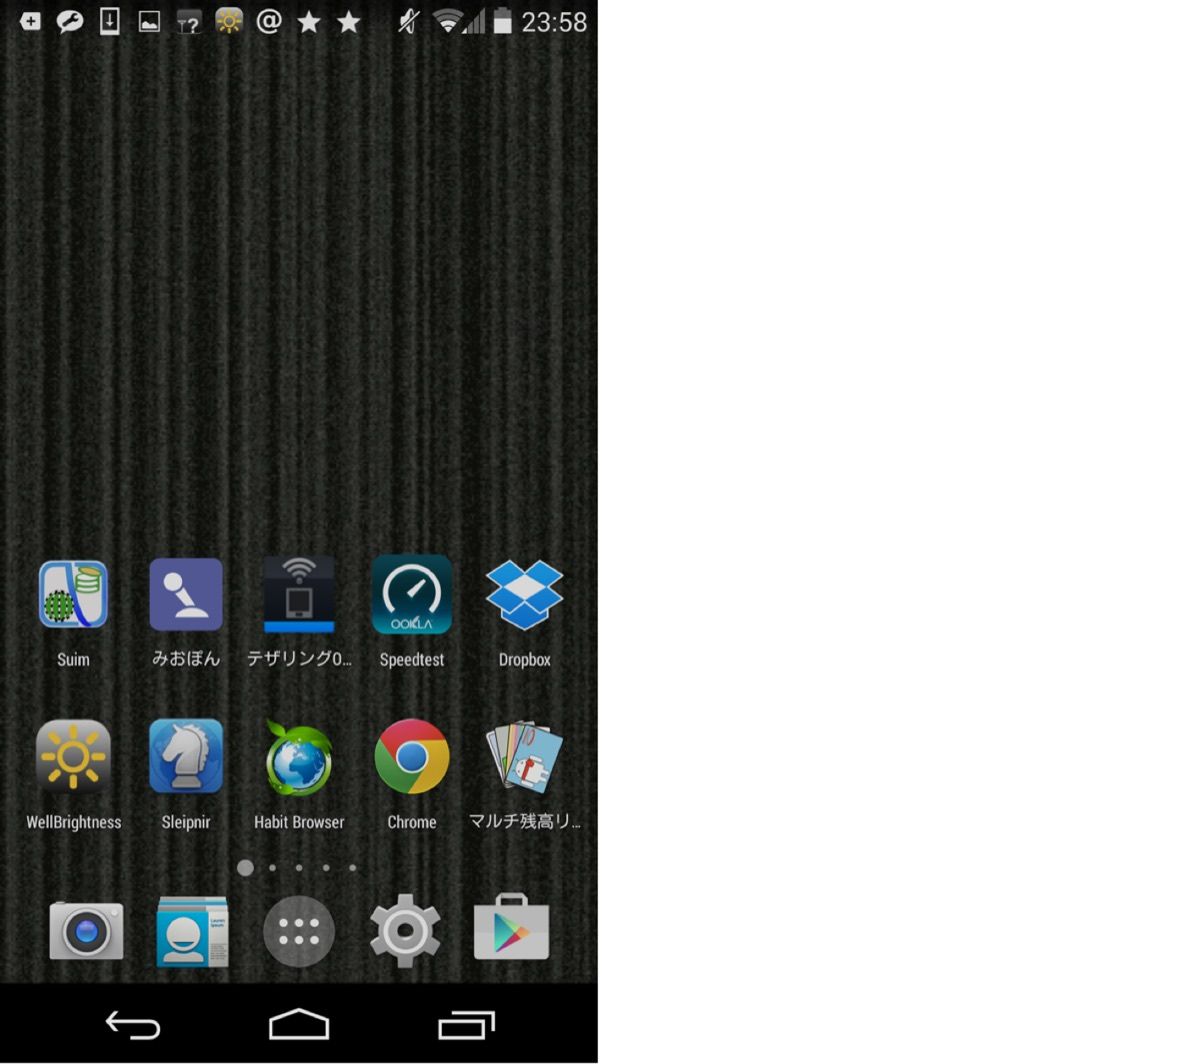 Androidのテザリングオンオフ切り替えアプリ